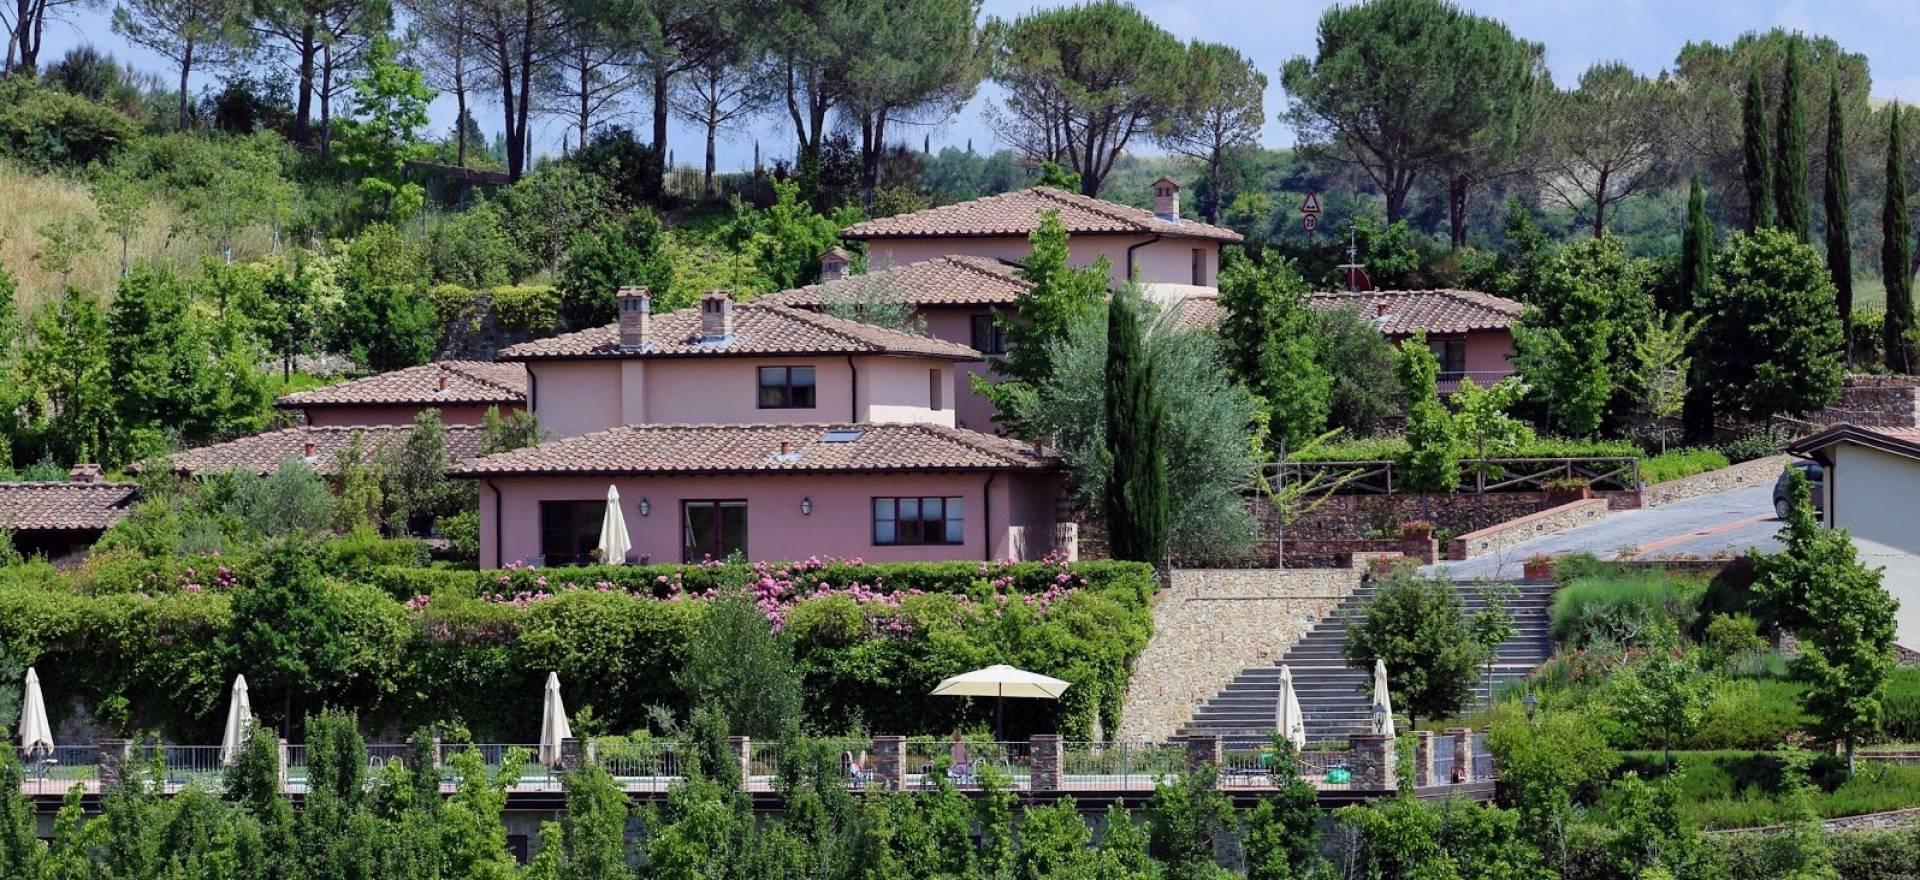 Agriturismo Tuscany Luxury agriturismo in the beautiful heart of Tuscany